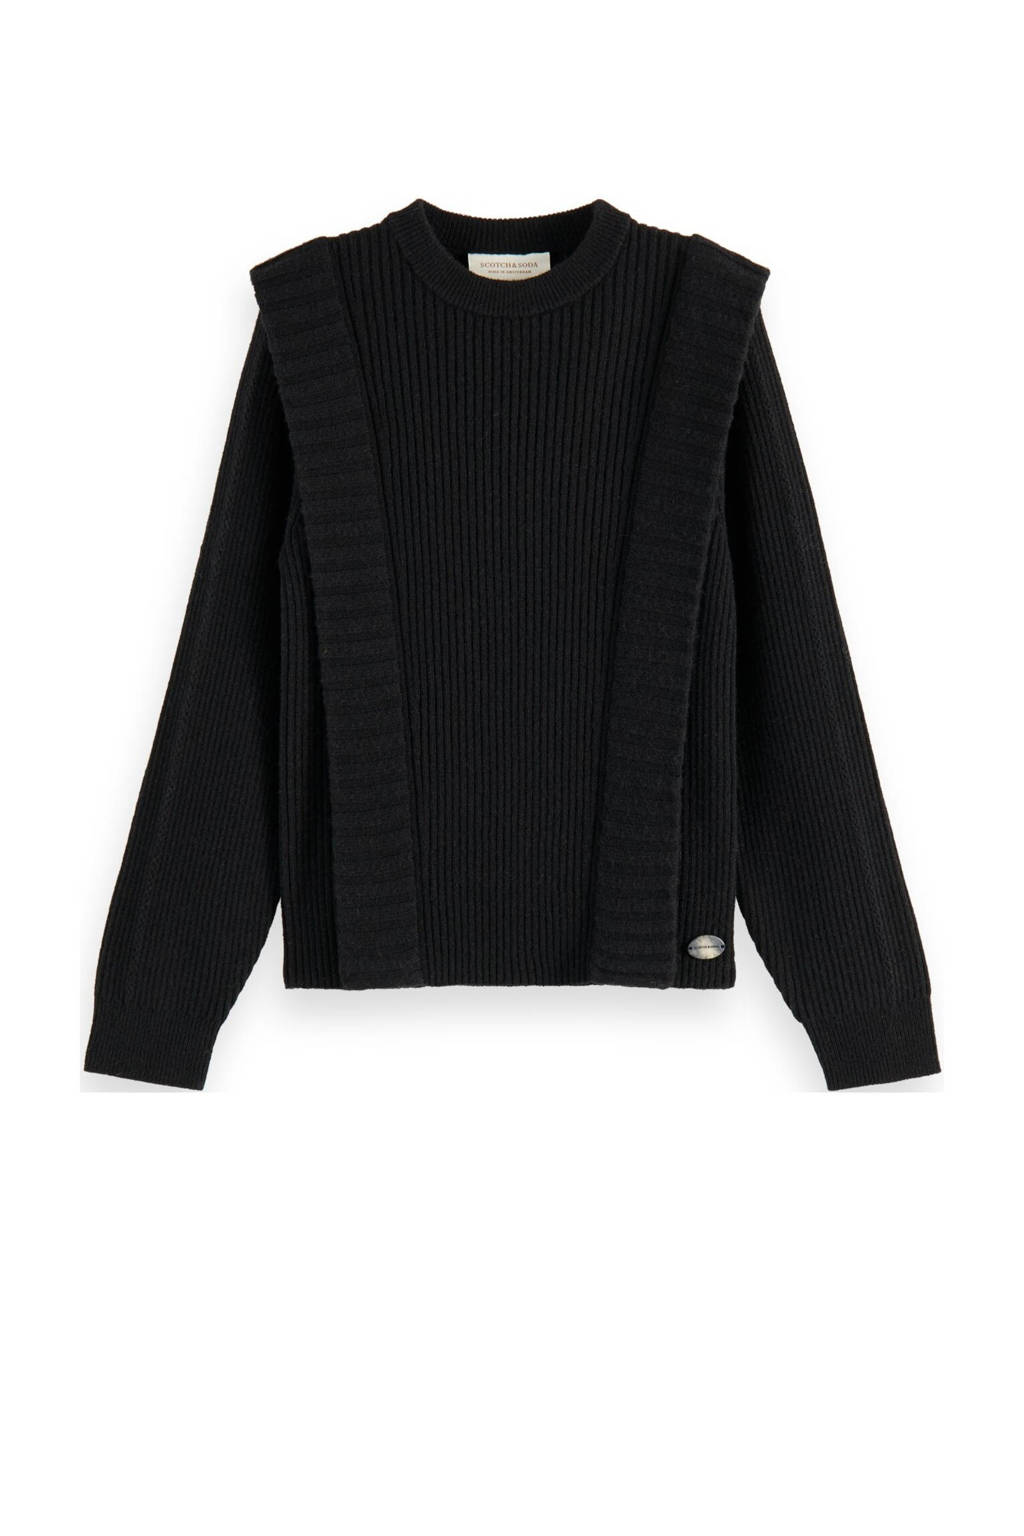 Scotch & Soda trui met wol zwart, Zwart